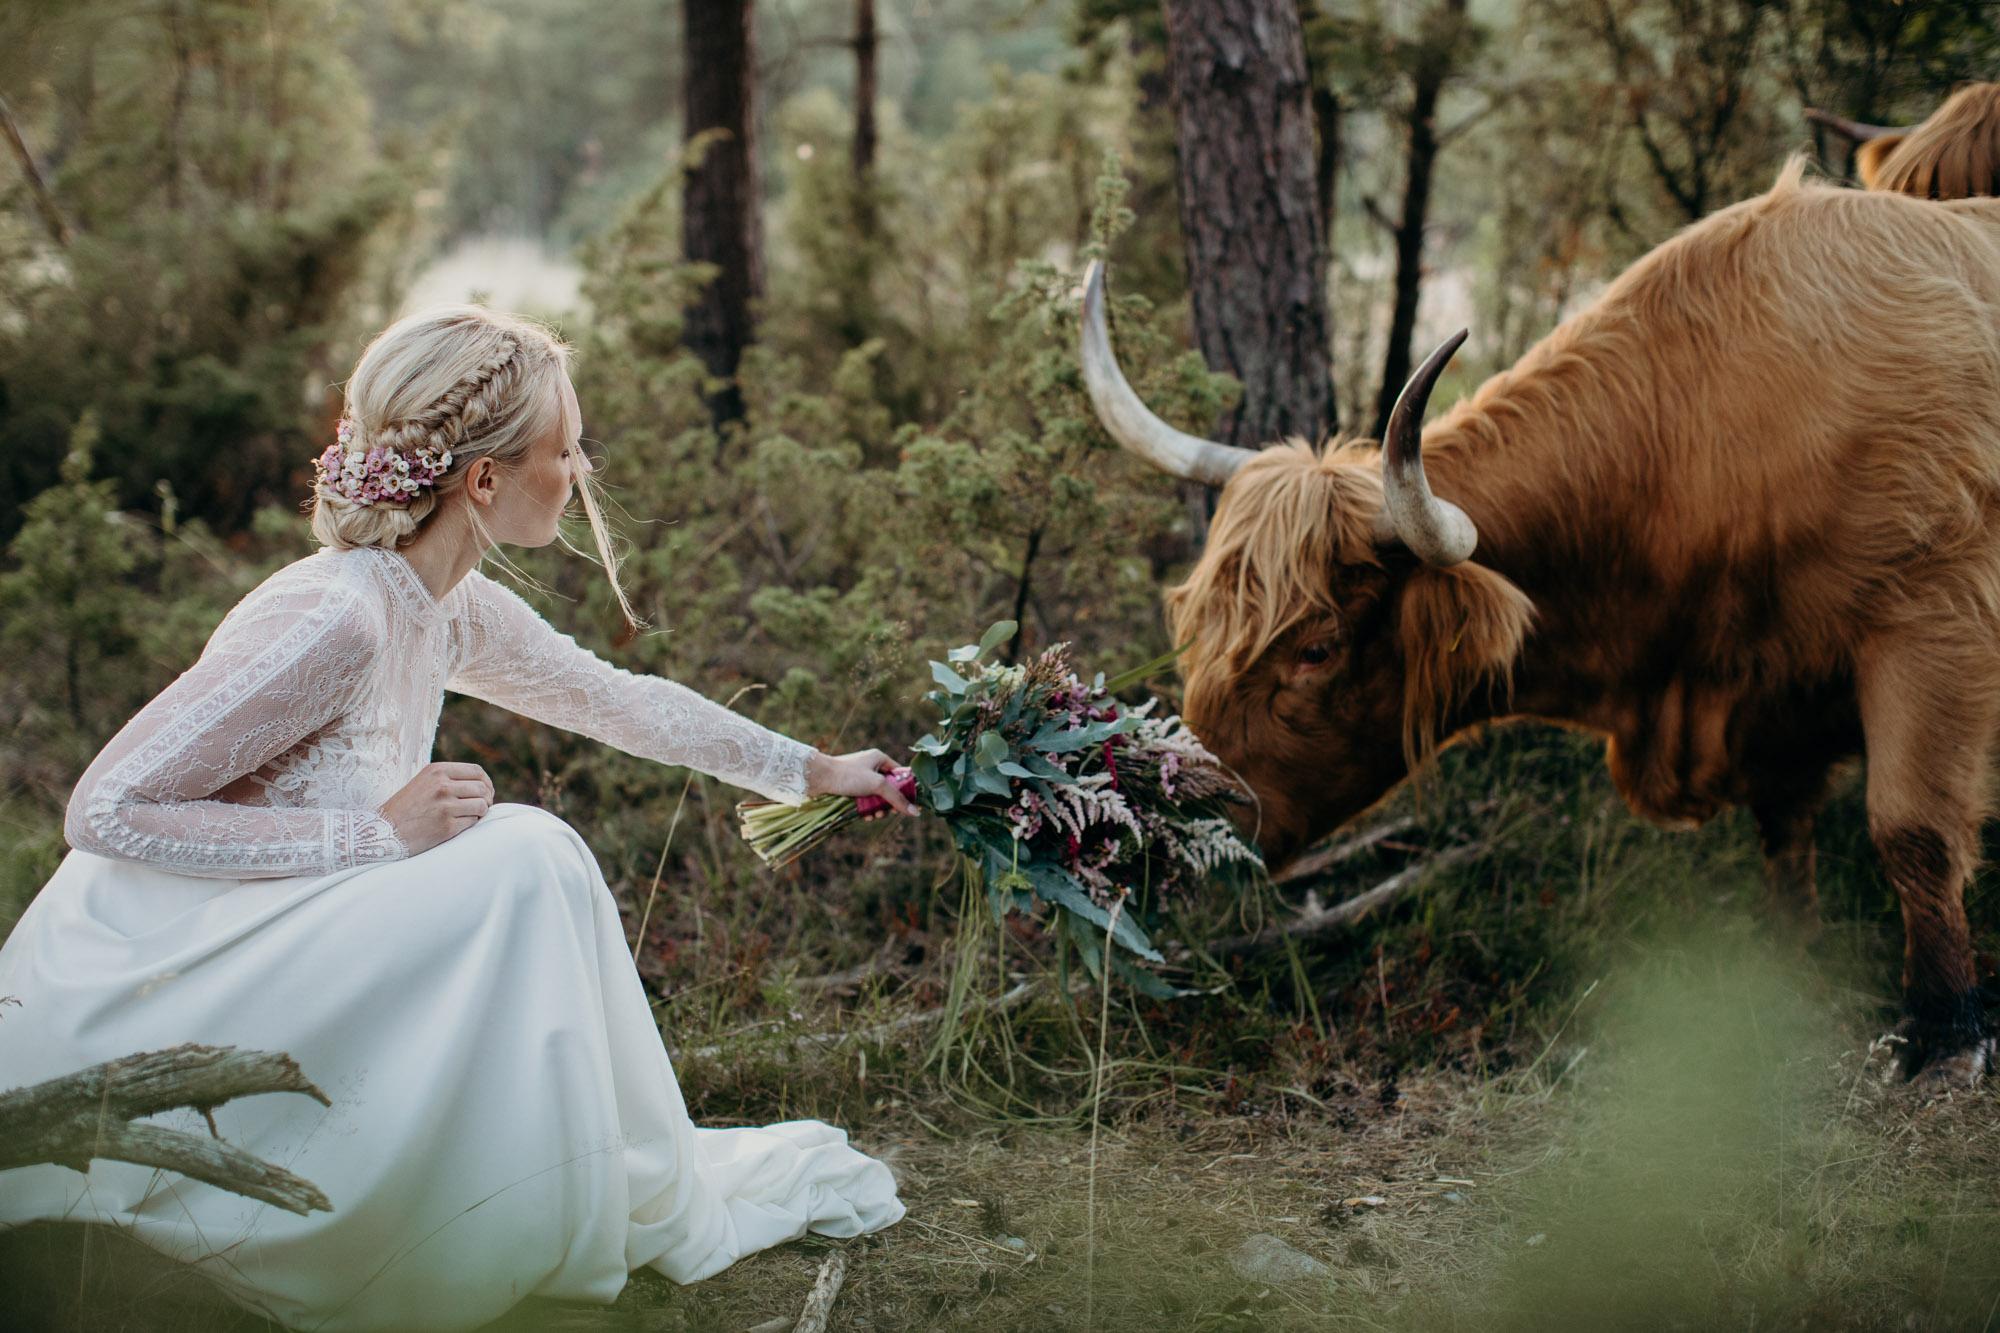 oro_weddings-jere_satamo-533.jpg